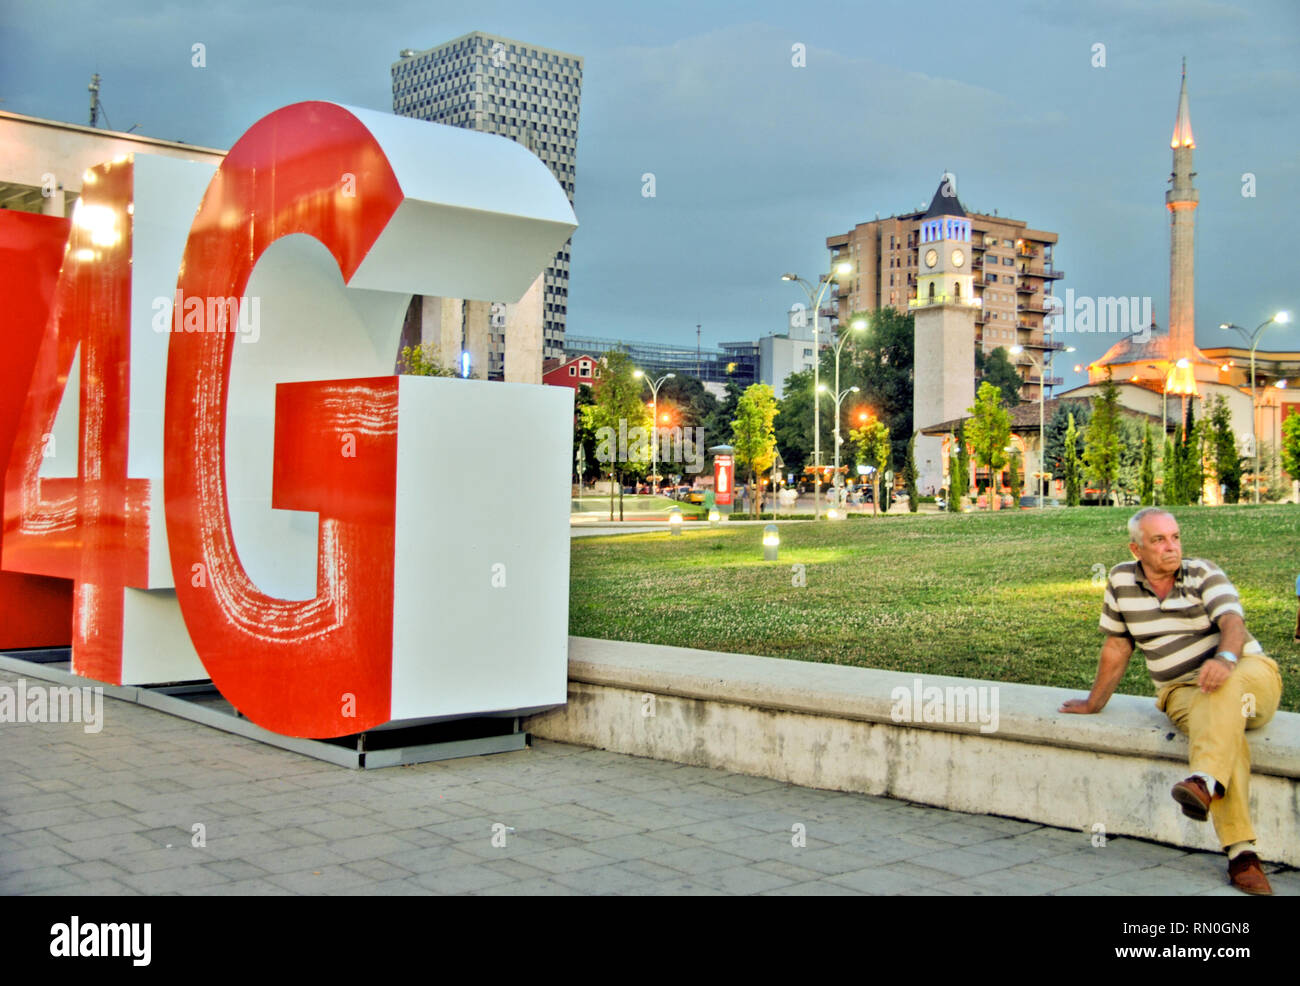 City centre of Tirana, capital of Albania. August 2015 - Stock Image